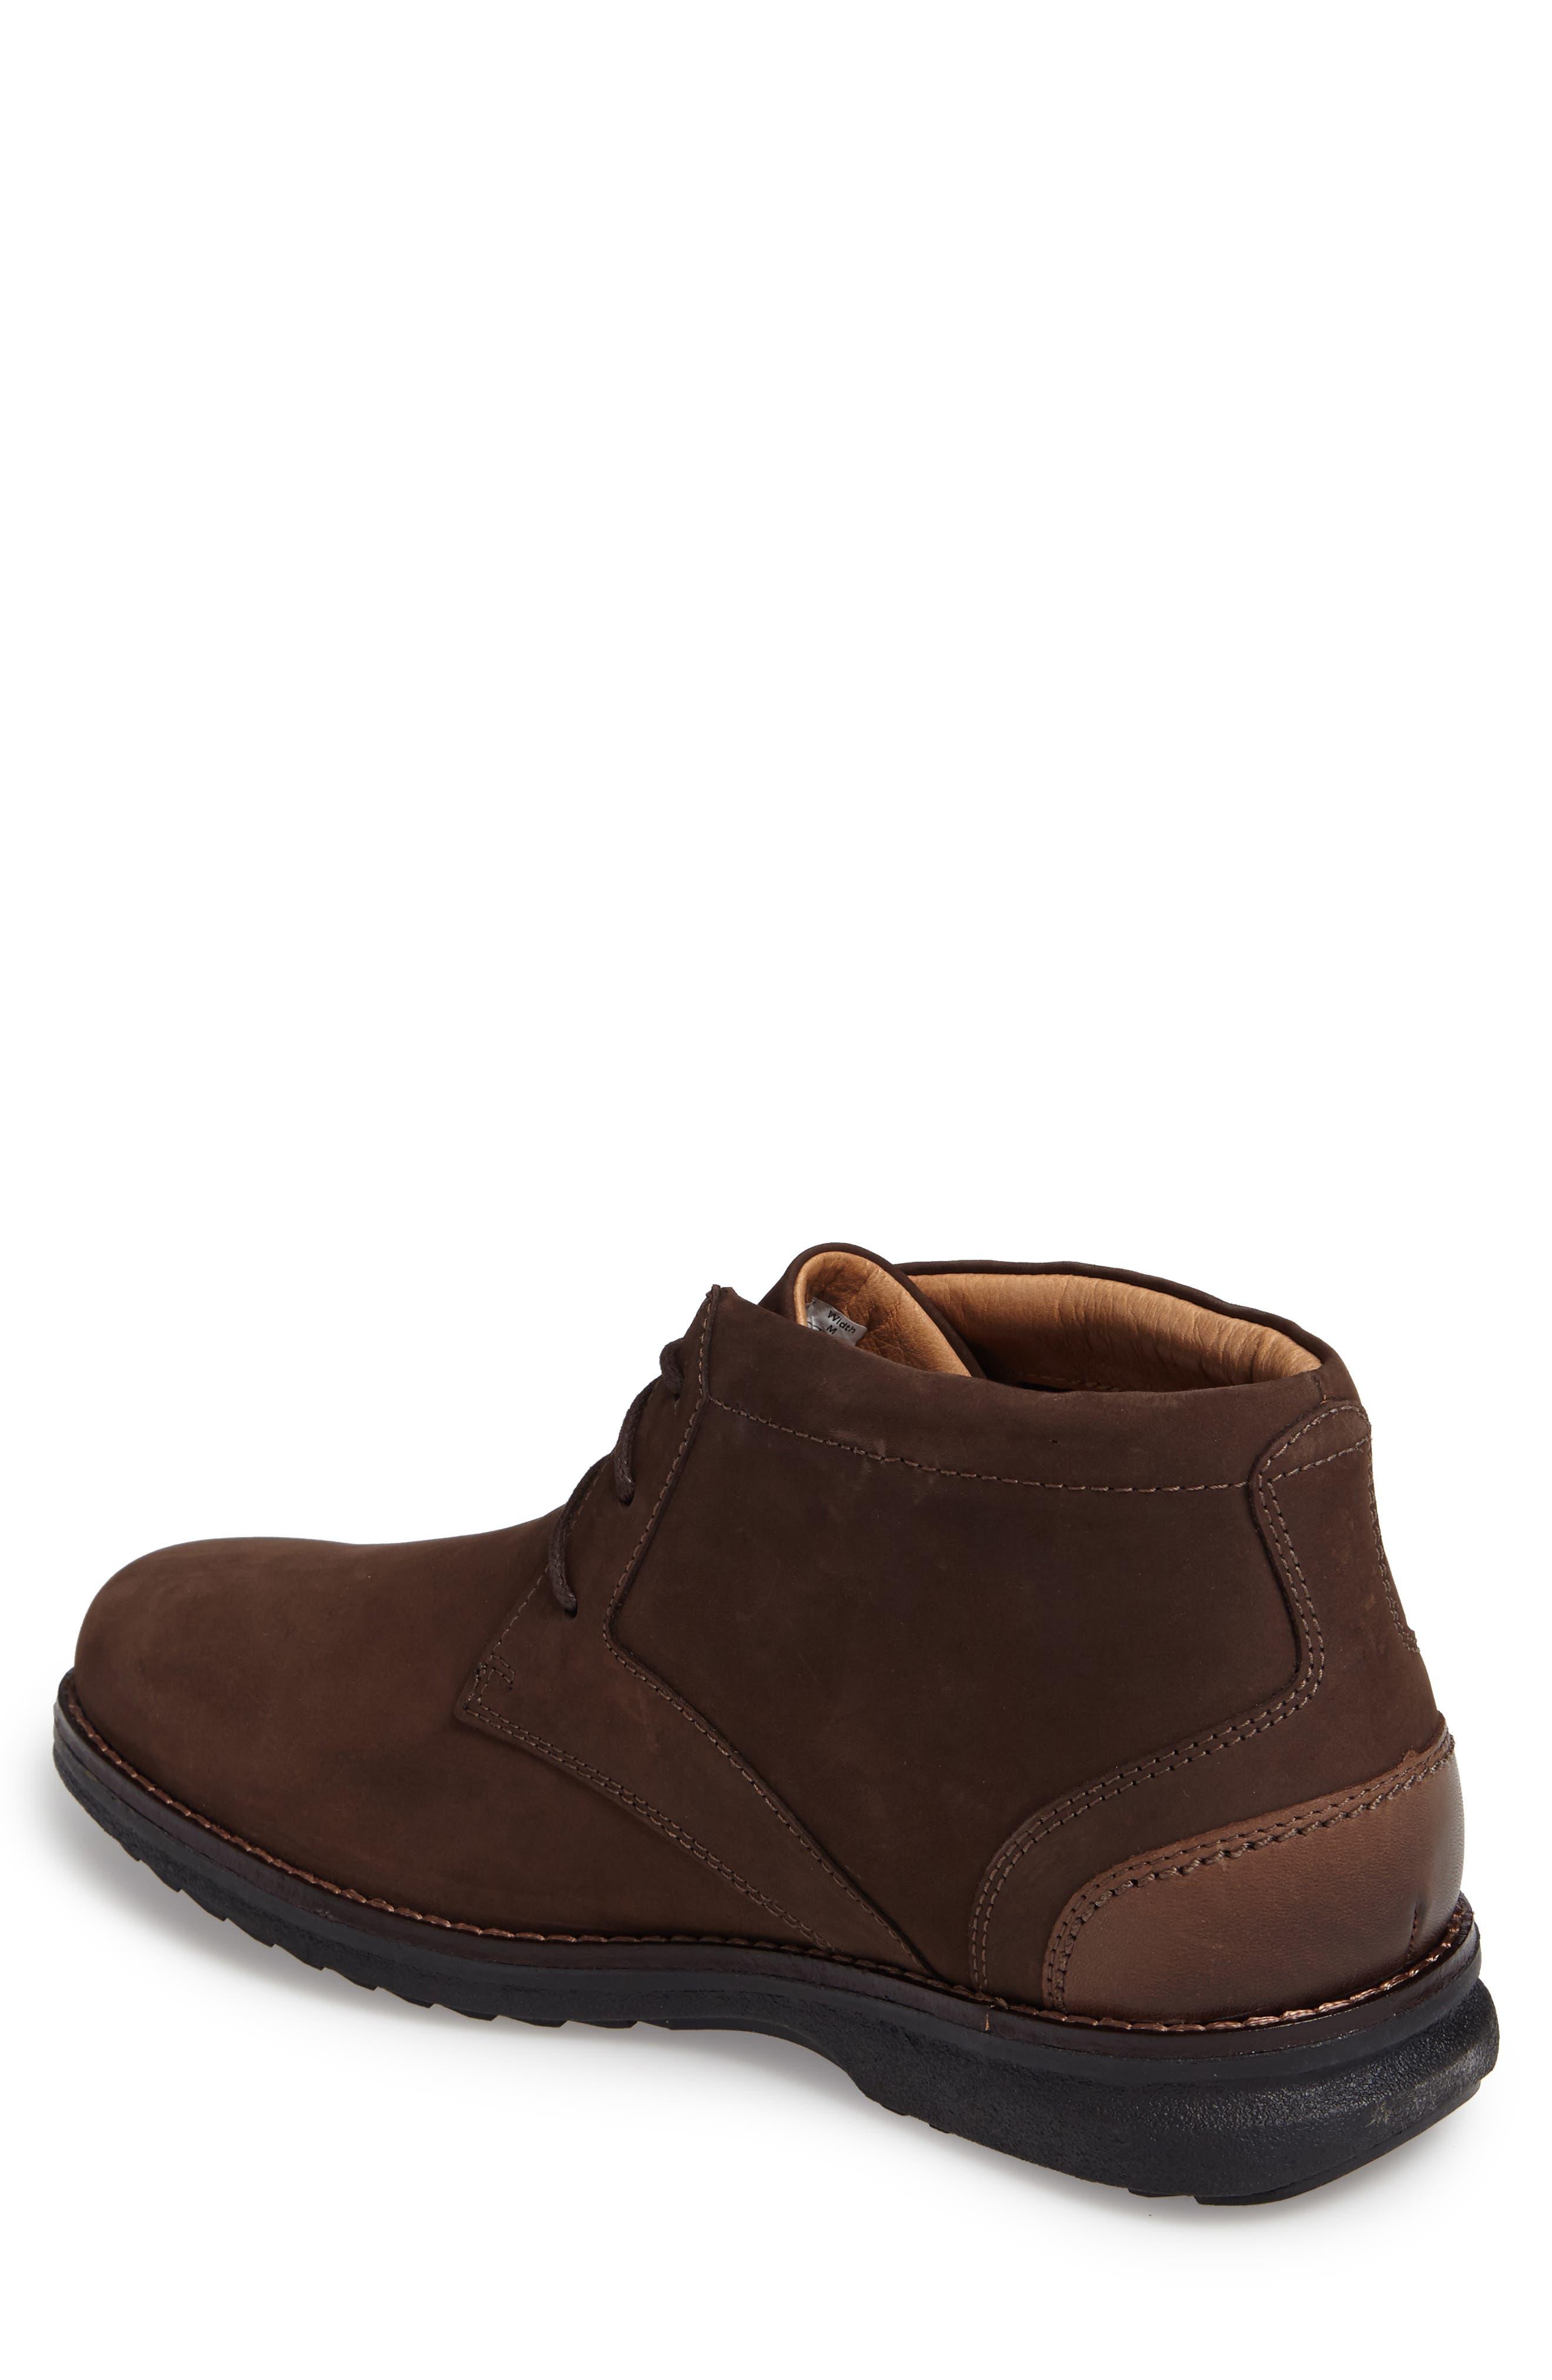 Premium Class Chukka Boot,                             Alternate thumbnail 3, color,